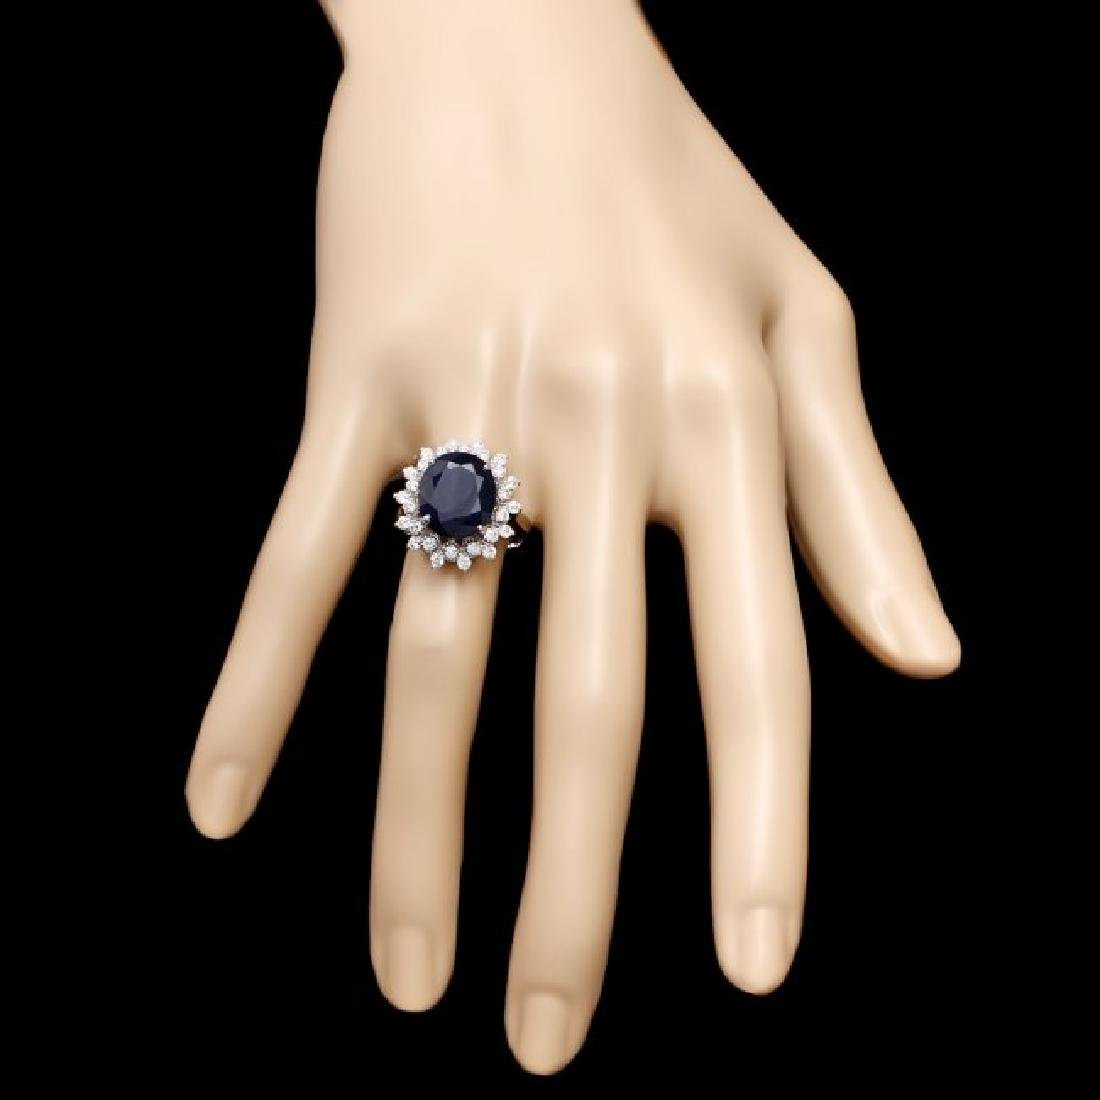 14k Gold 6.50ct Sapphire 0.85ct Diamond Ring - 4